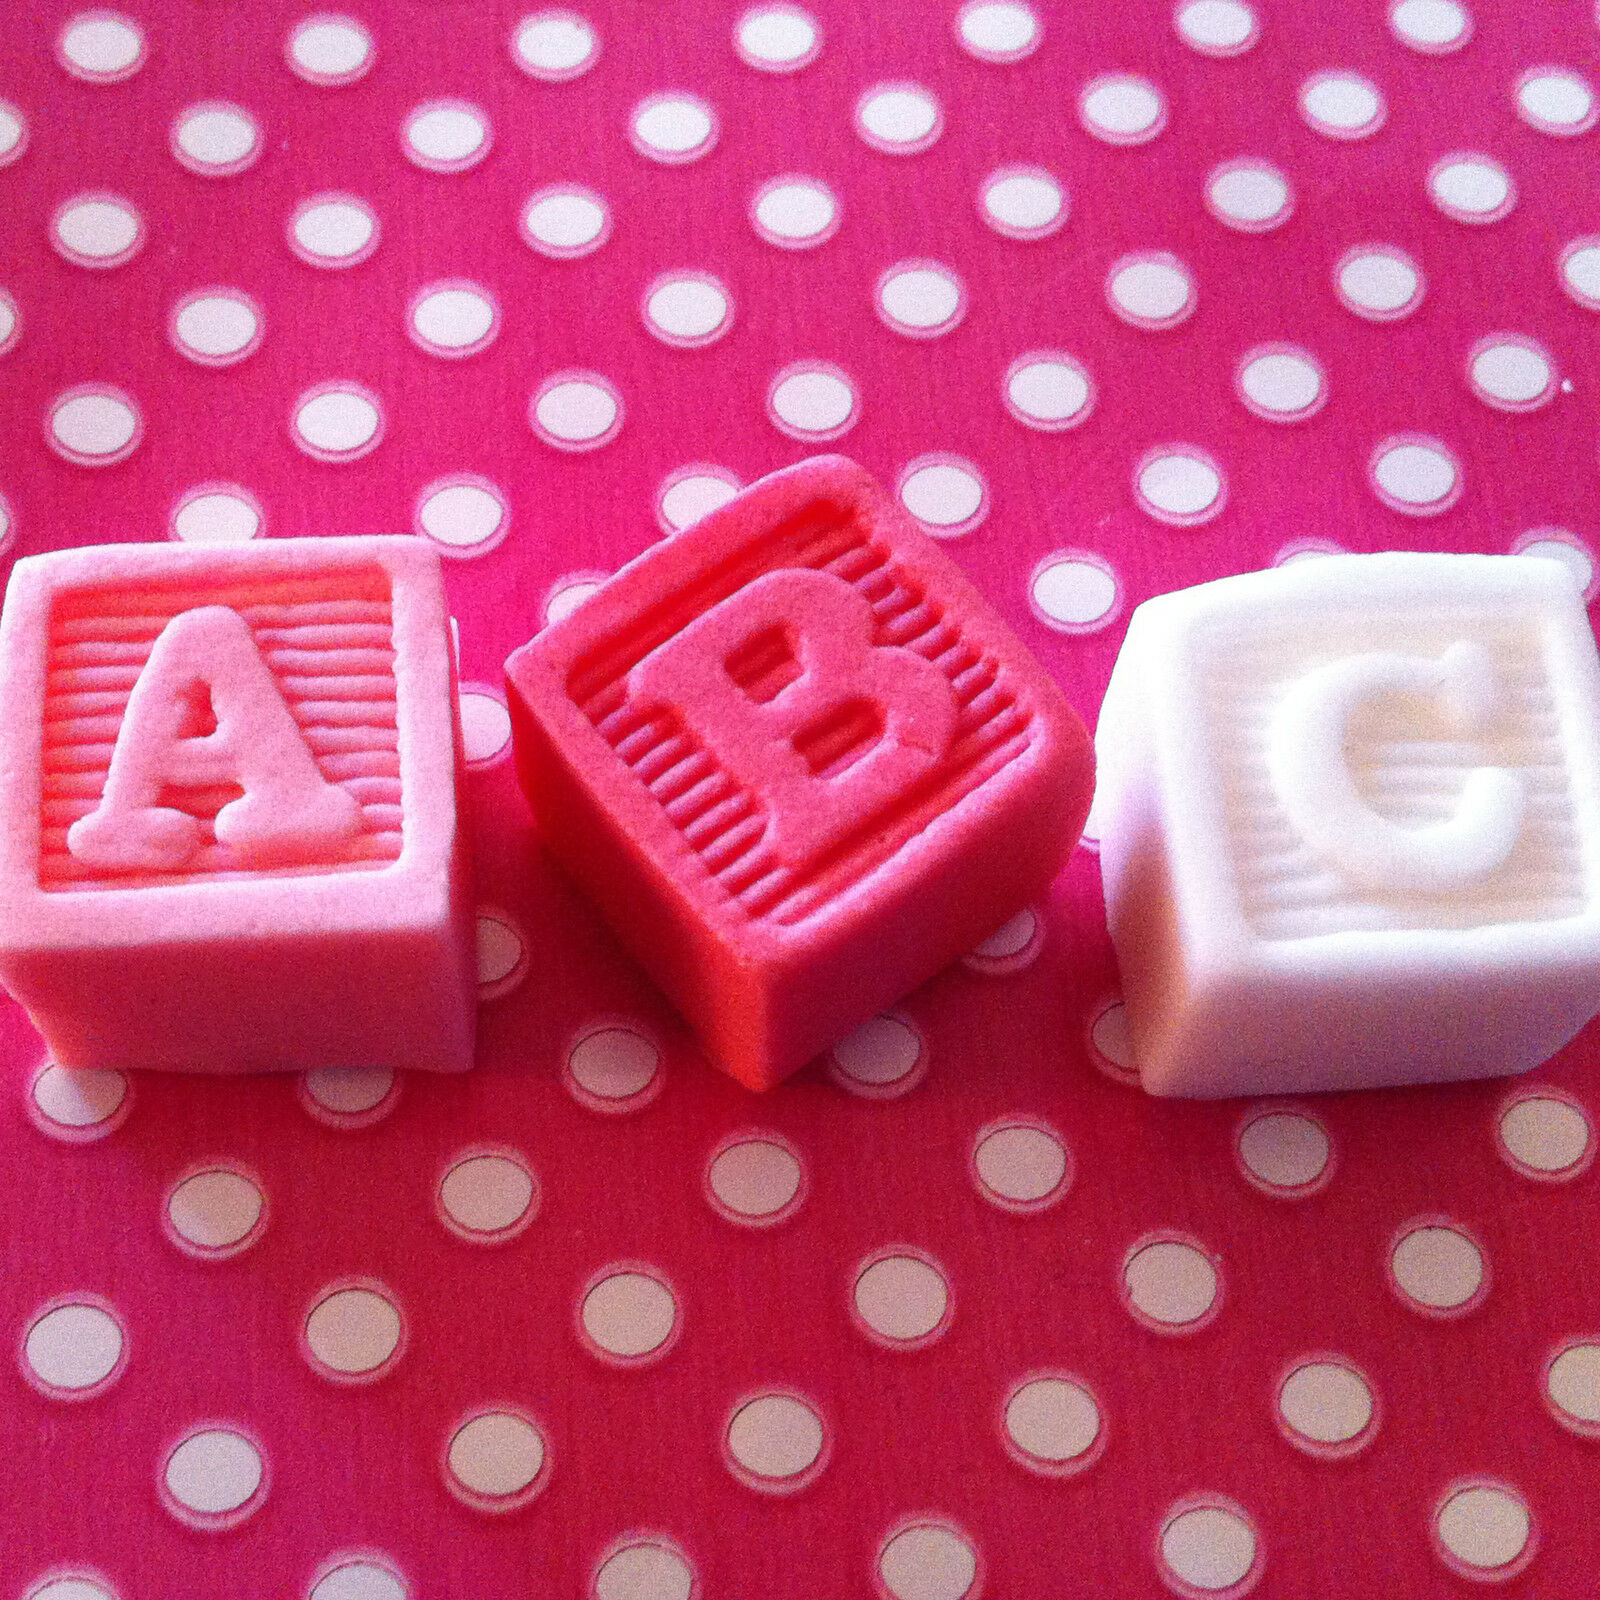 9 edible toy abc name blocks baby shower christening for Alphabet blocks cake decoration